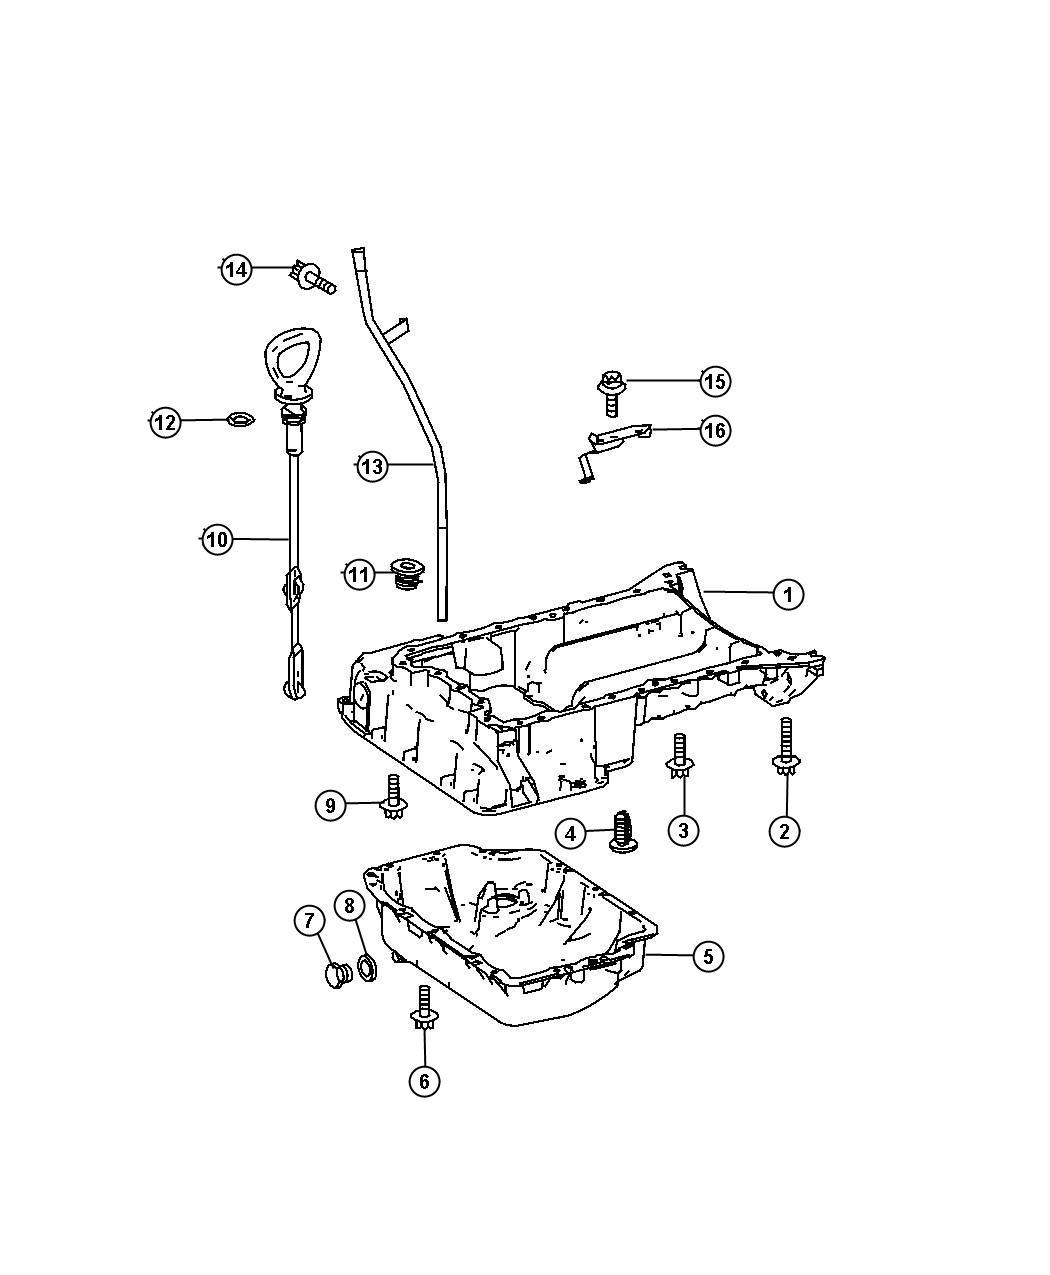 2008 Dodge Sprinter 2500 Indicator. Engine oil level. Pan